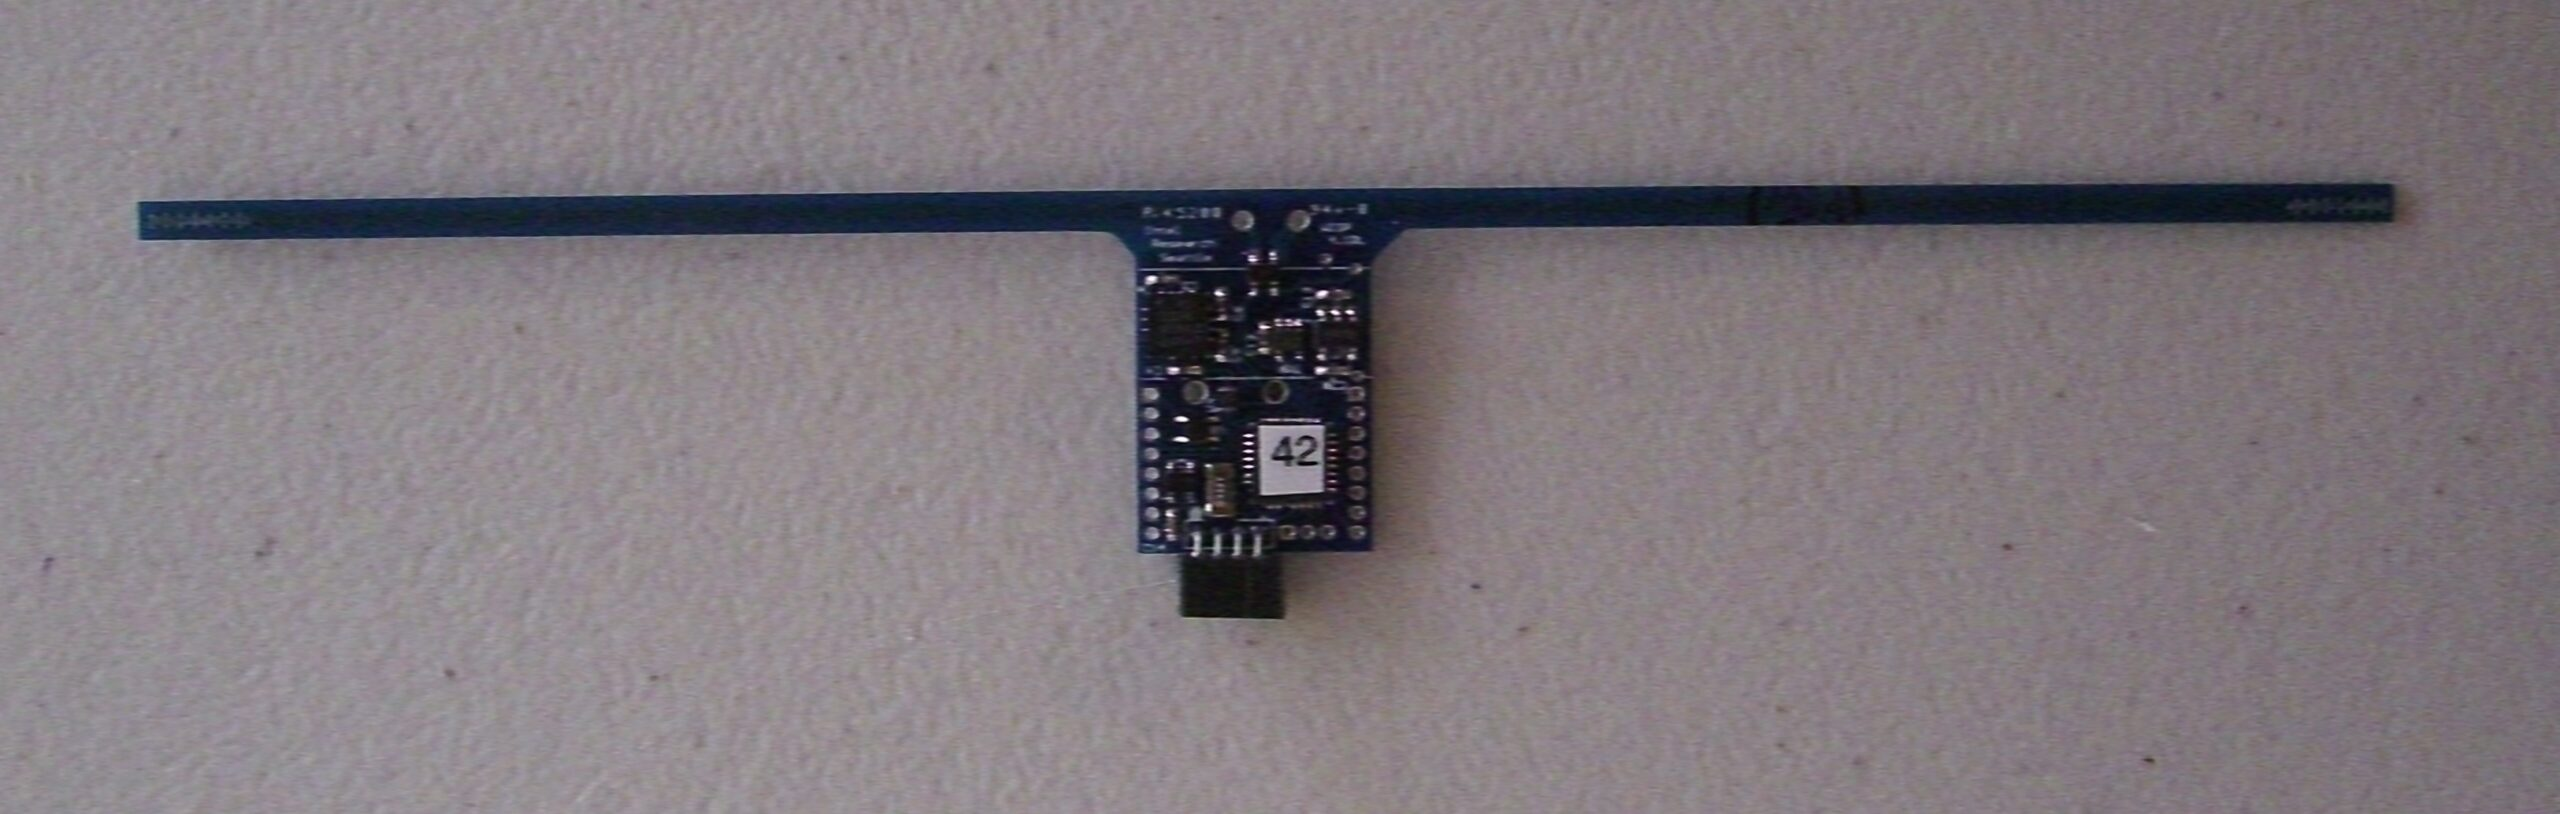 Wireless sensor. Image credit: U-M Engineering